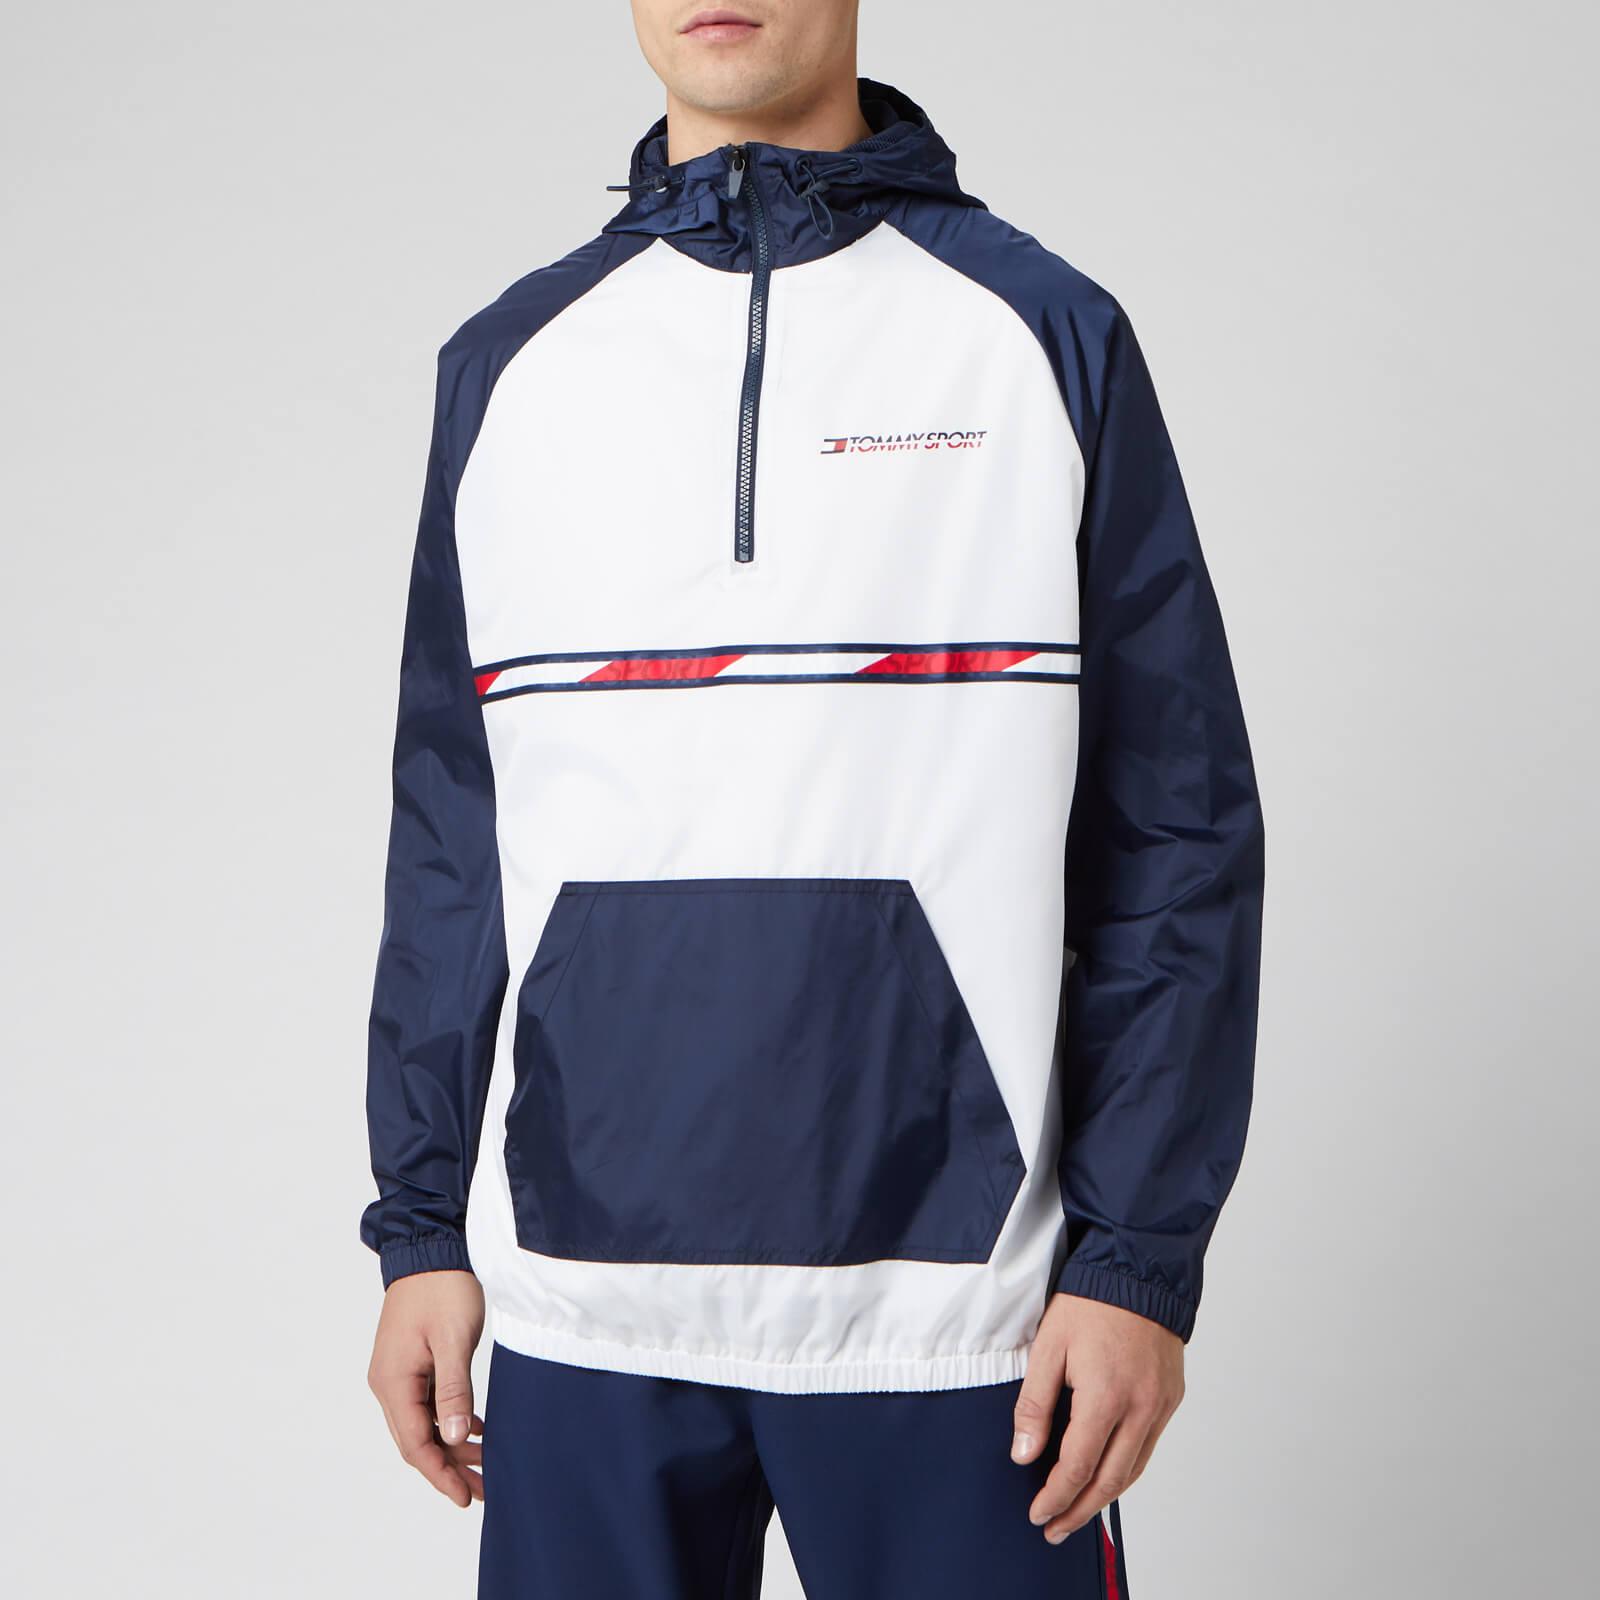 Tommy Sport Men's Woven Jacket - PVH White - XL